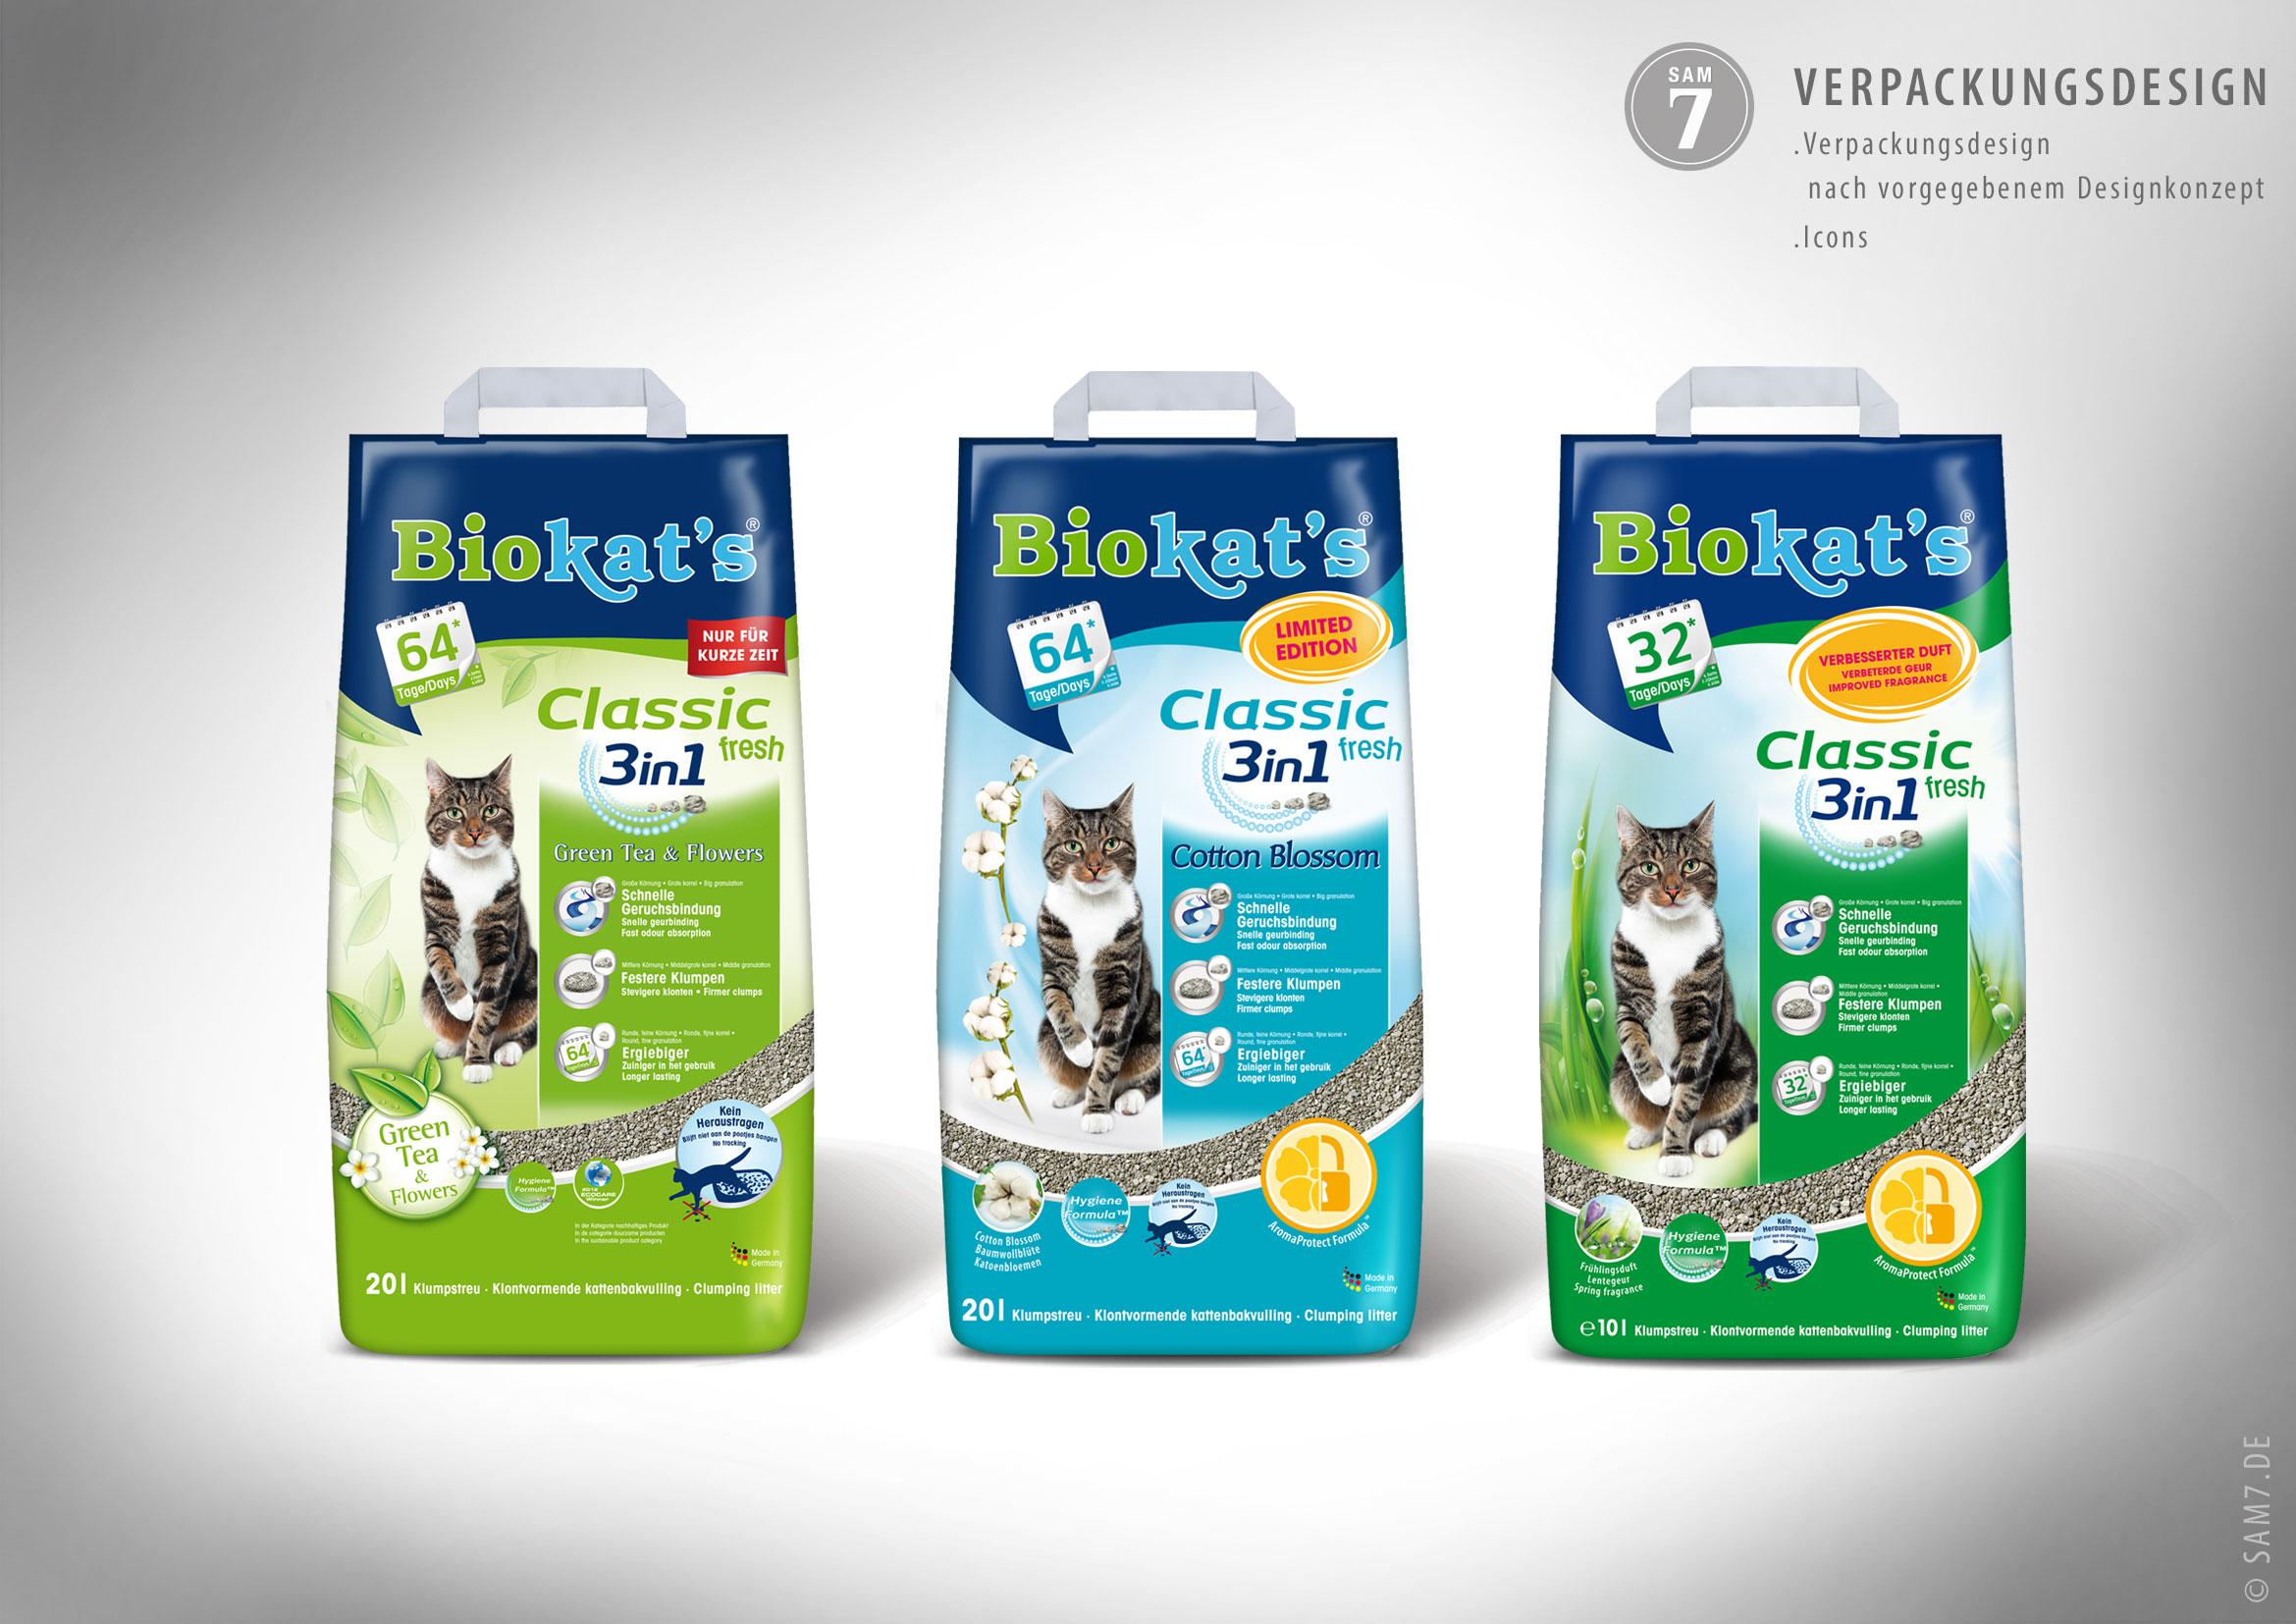 Verpackungsdesign Biokats.